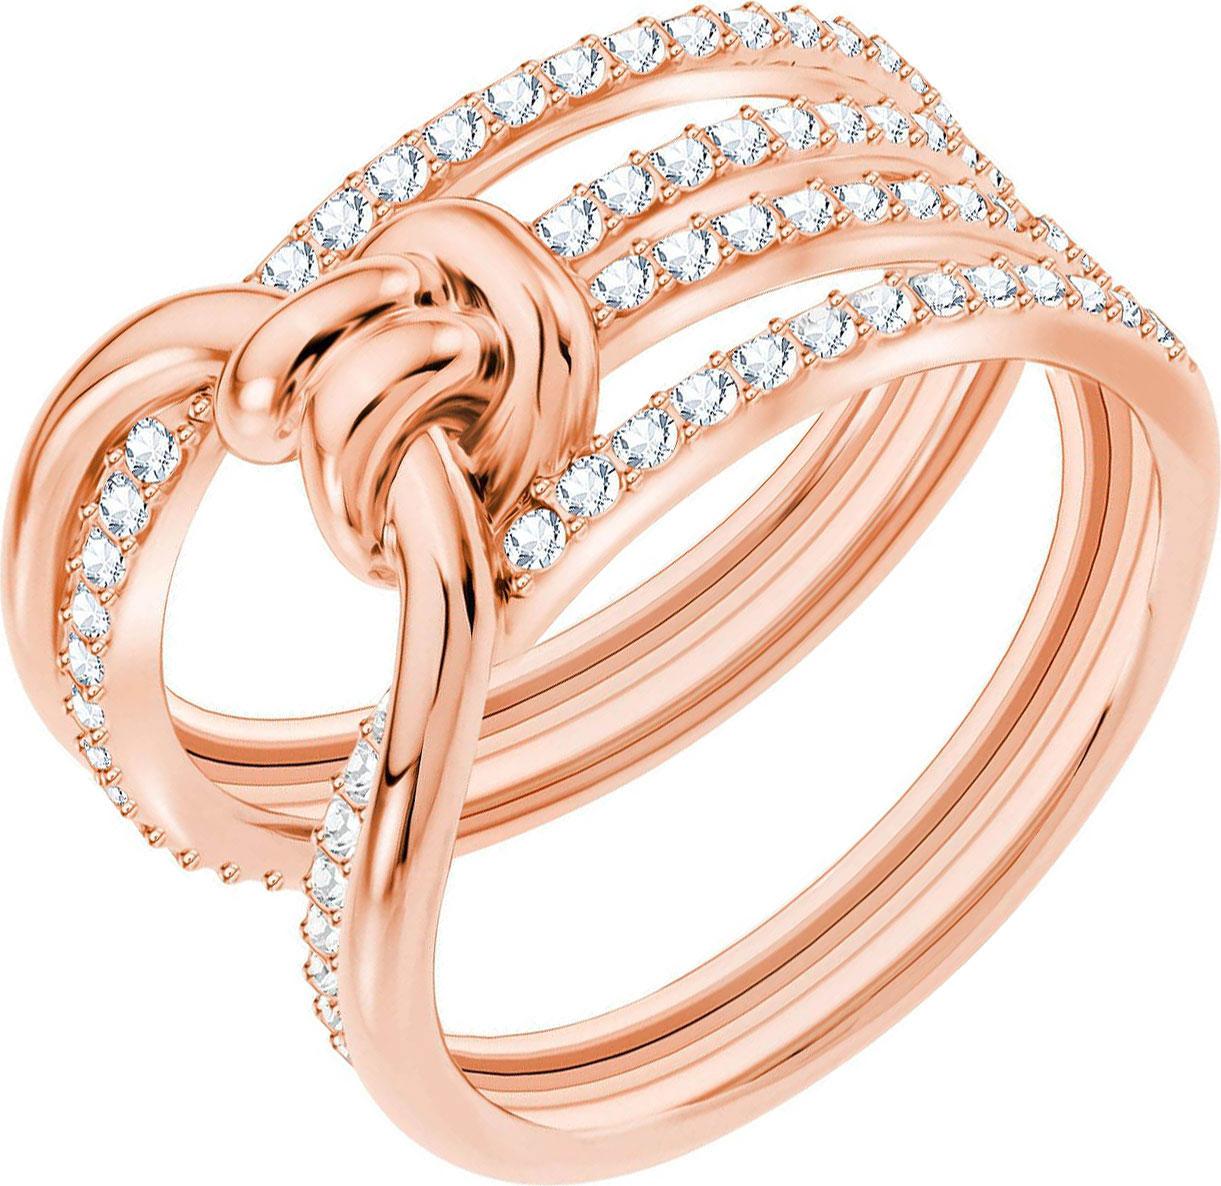 Кольца Swarovski 5412071 swarovski swarovski кольца кольца романтический элегантный минималистский аксессуары no 503291552